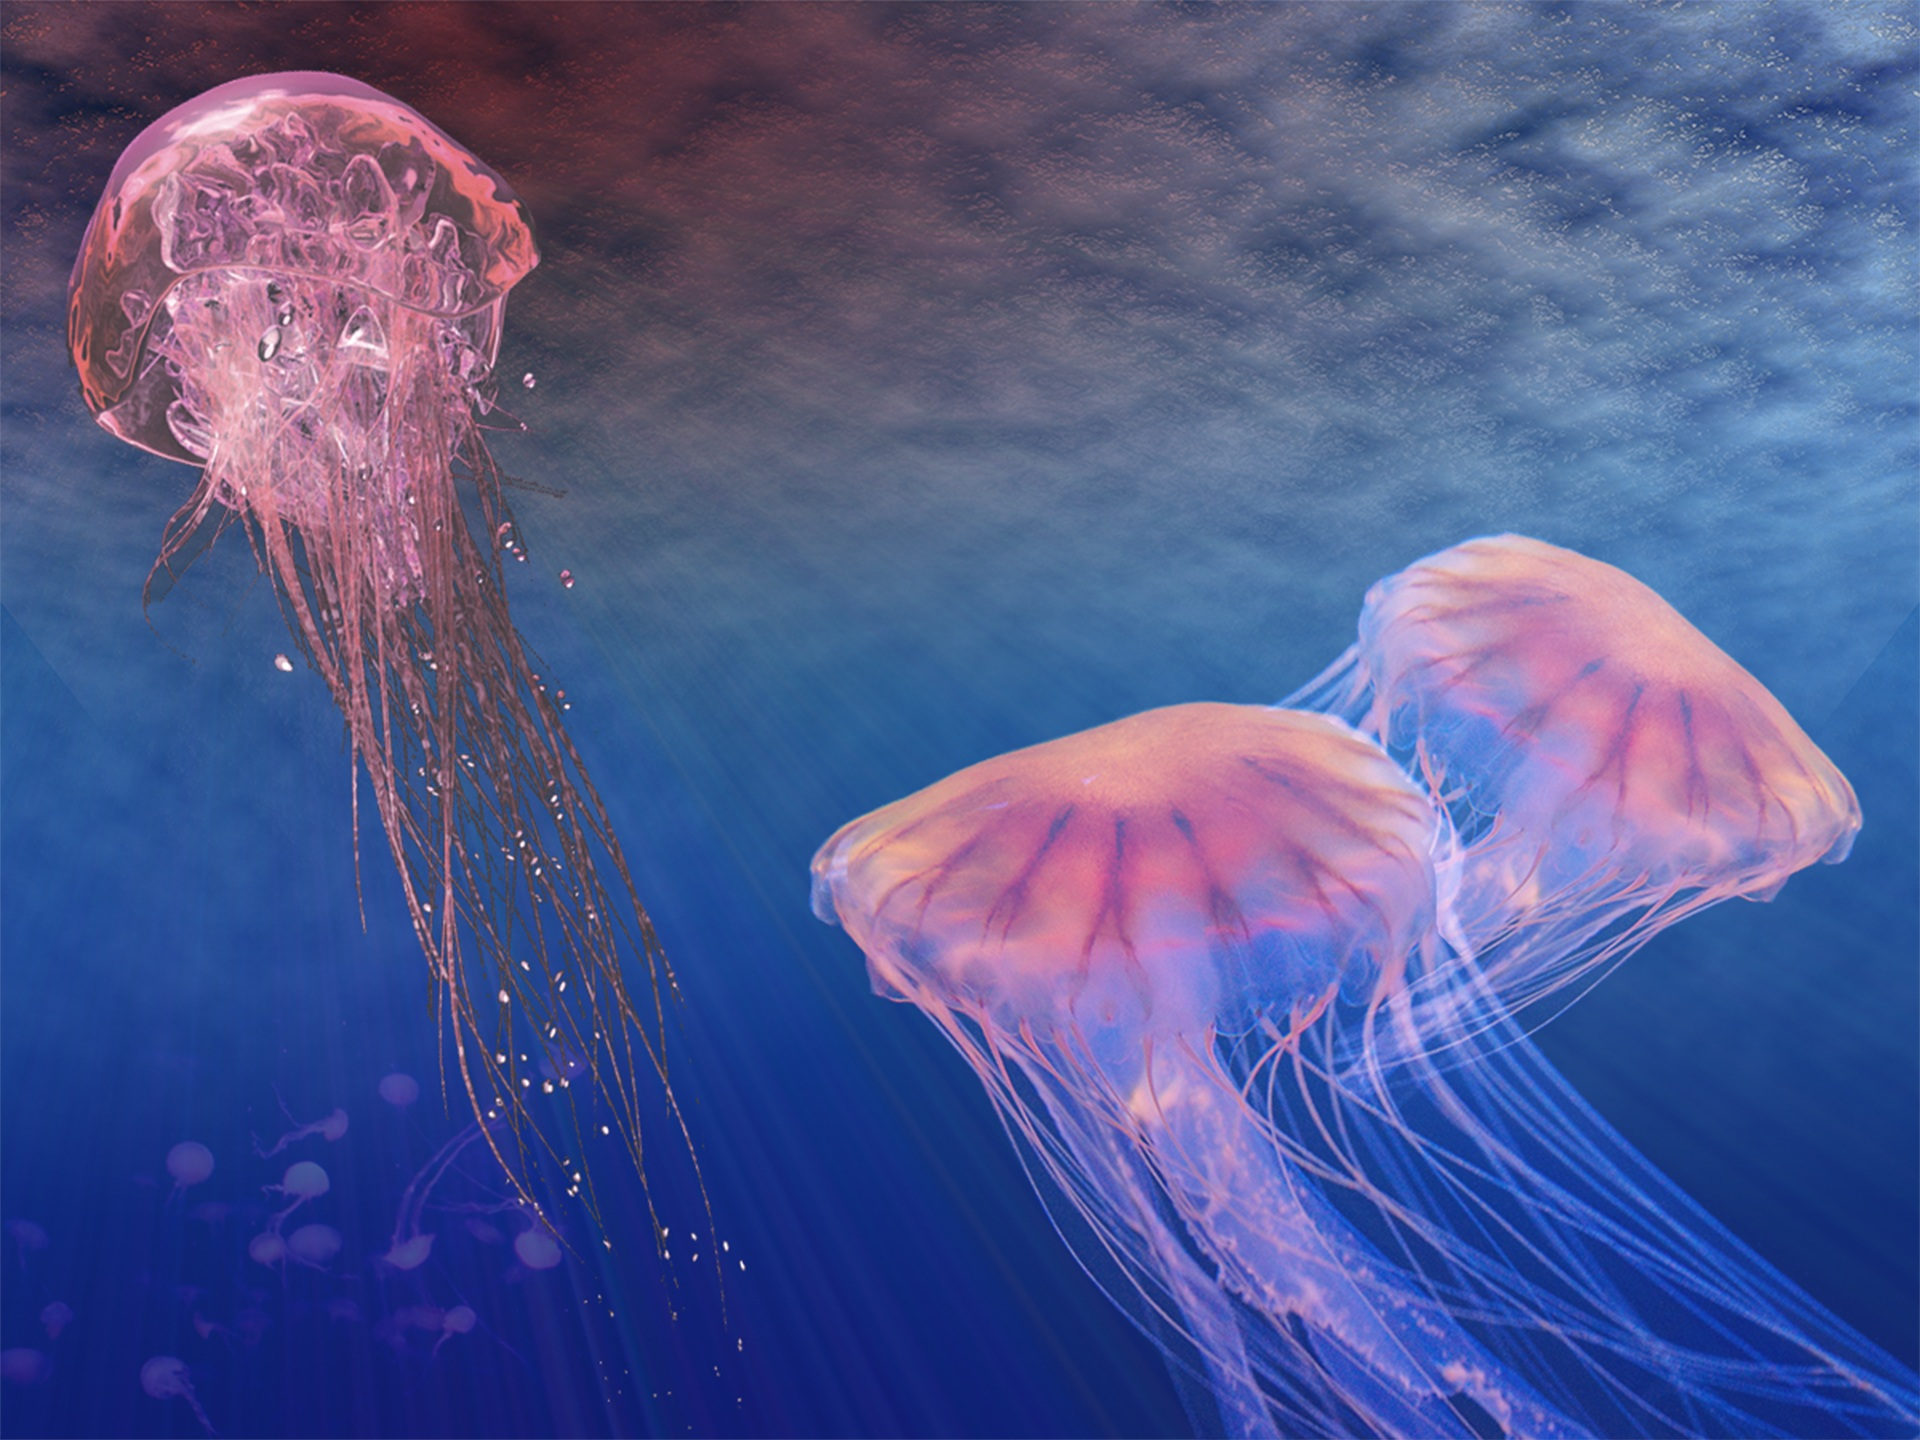 meduse, vita marina, Mare, Ocean, profondità, Rosa - Sfondi HD - Professor-falken.com